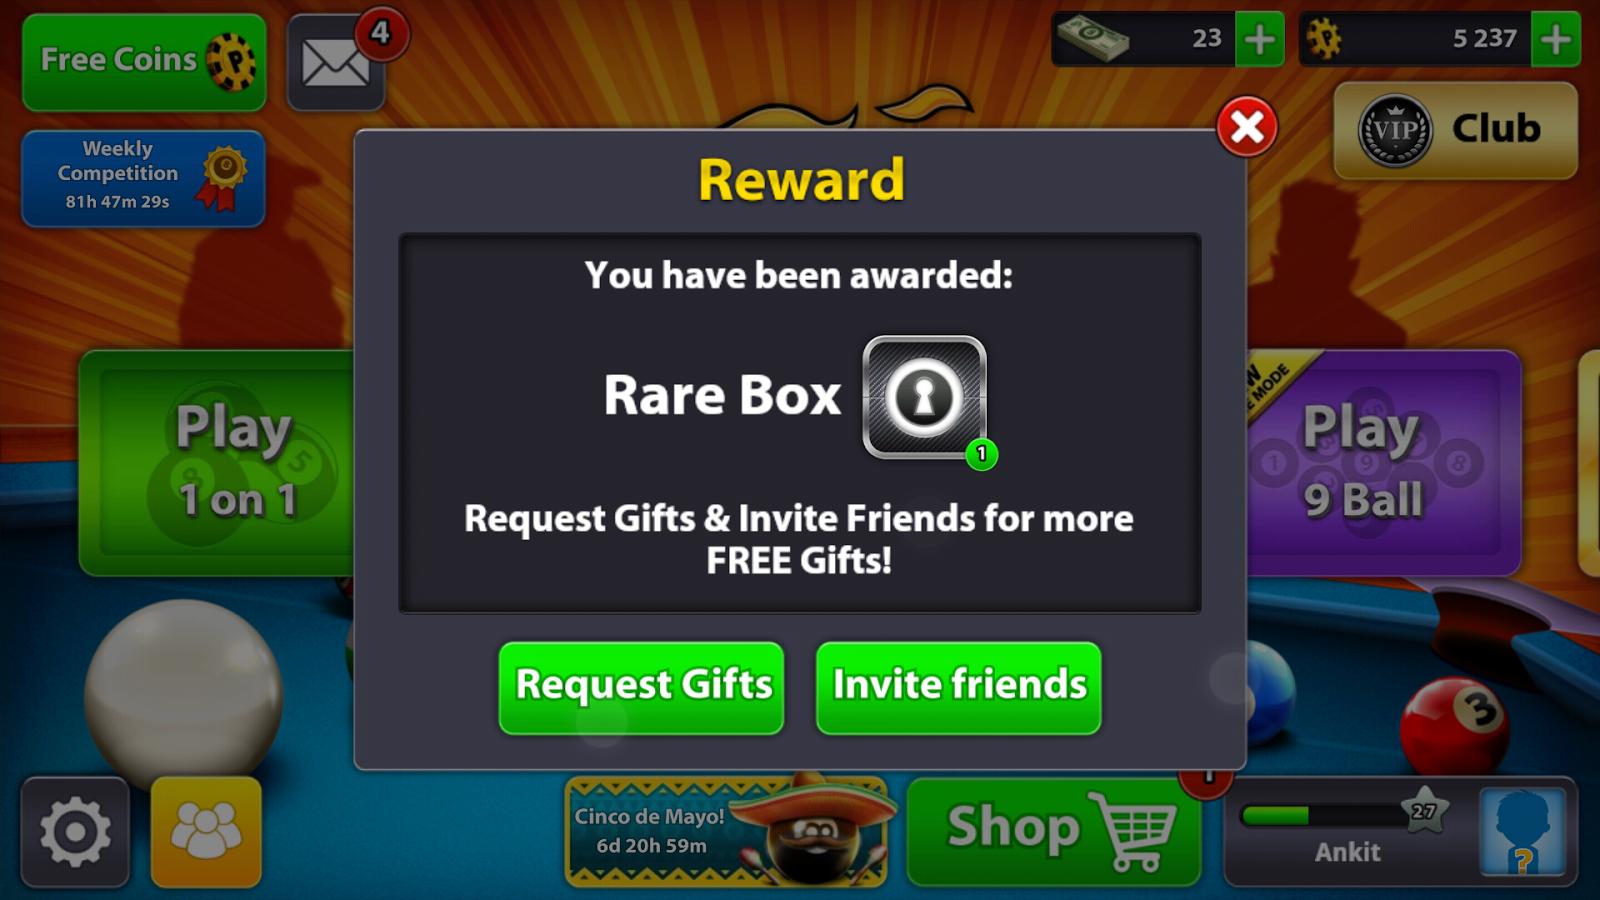 8 Ball Pool Cue Reward App Download